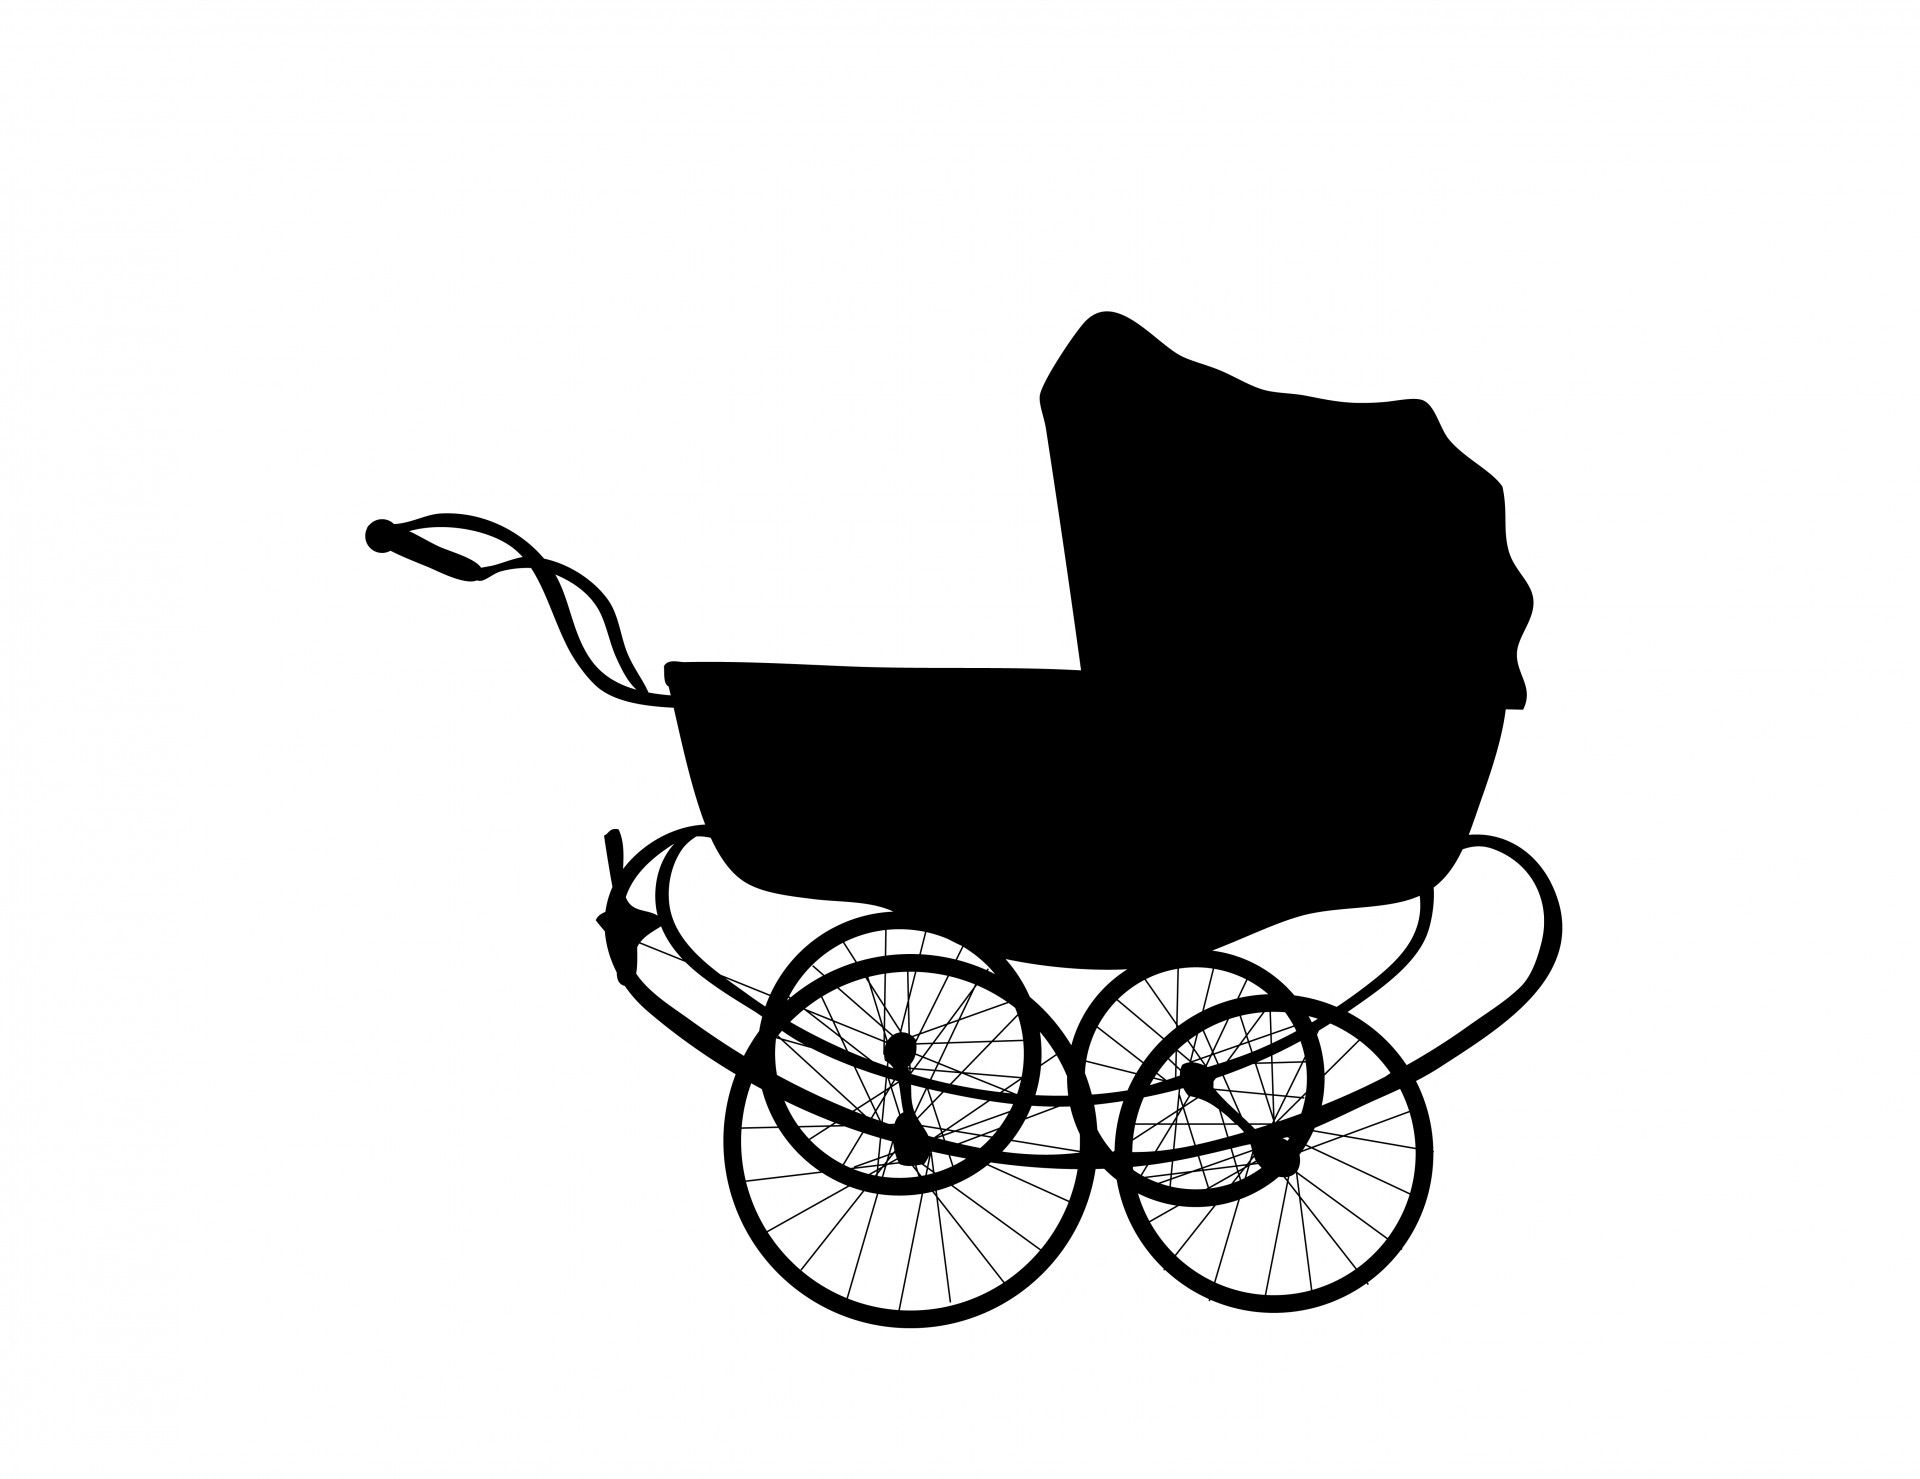 baby carriage clipart images public domain pictures page 1 rh pinterest com vintage baby carriage free clipart free clipart baby carriage